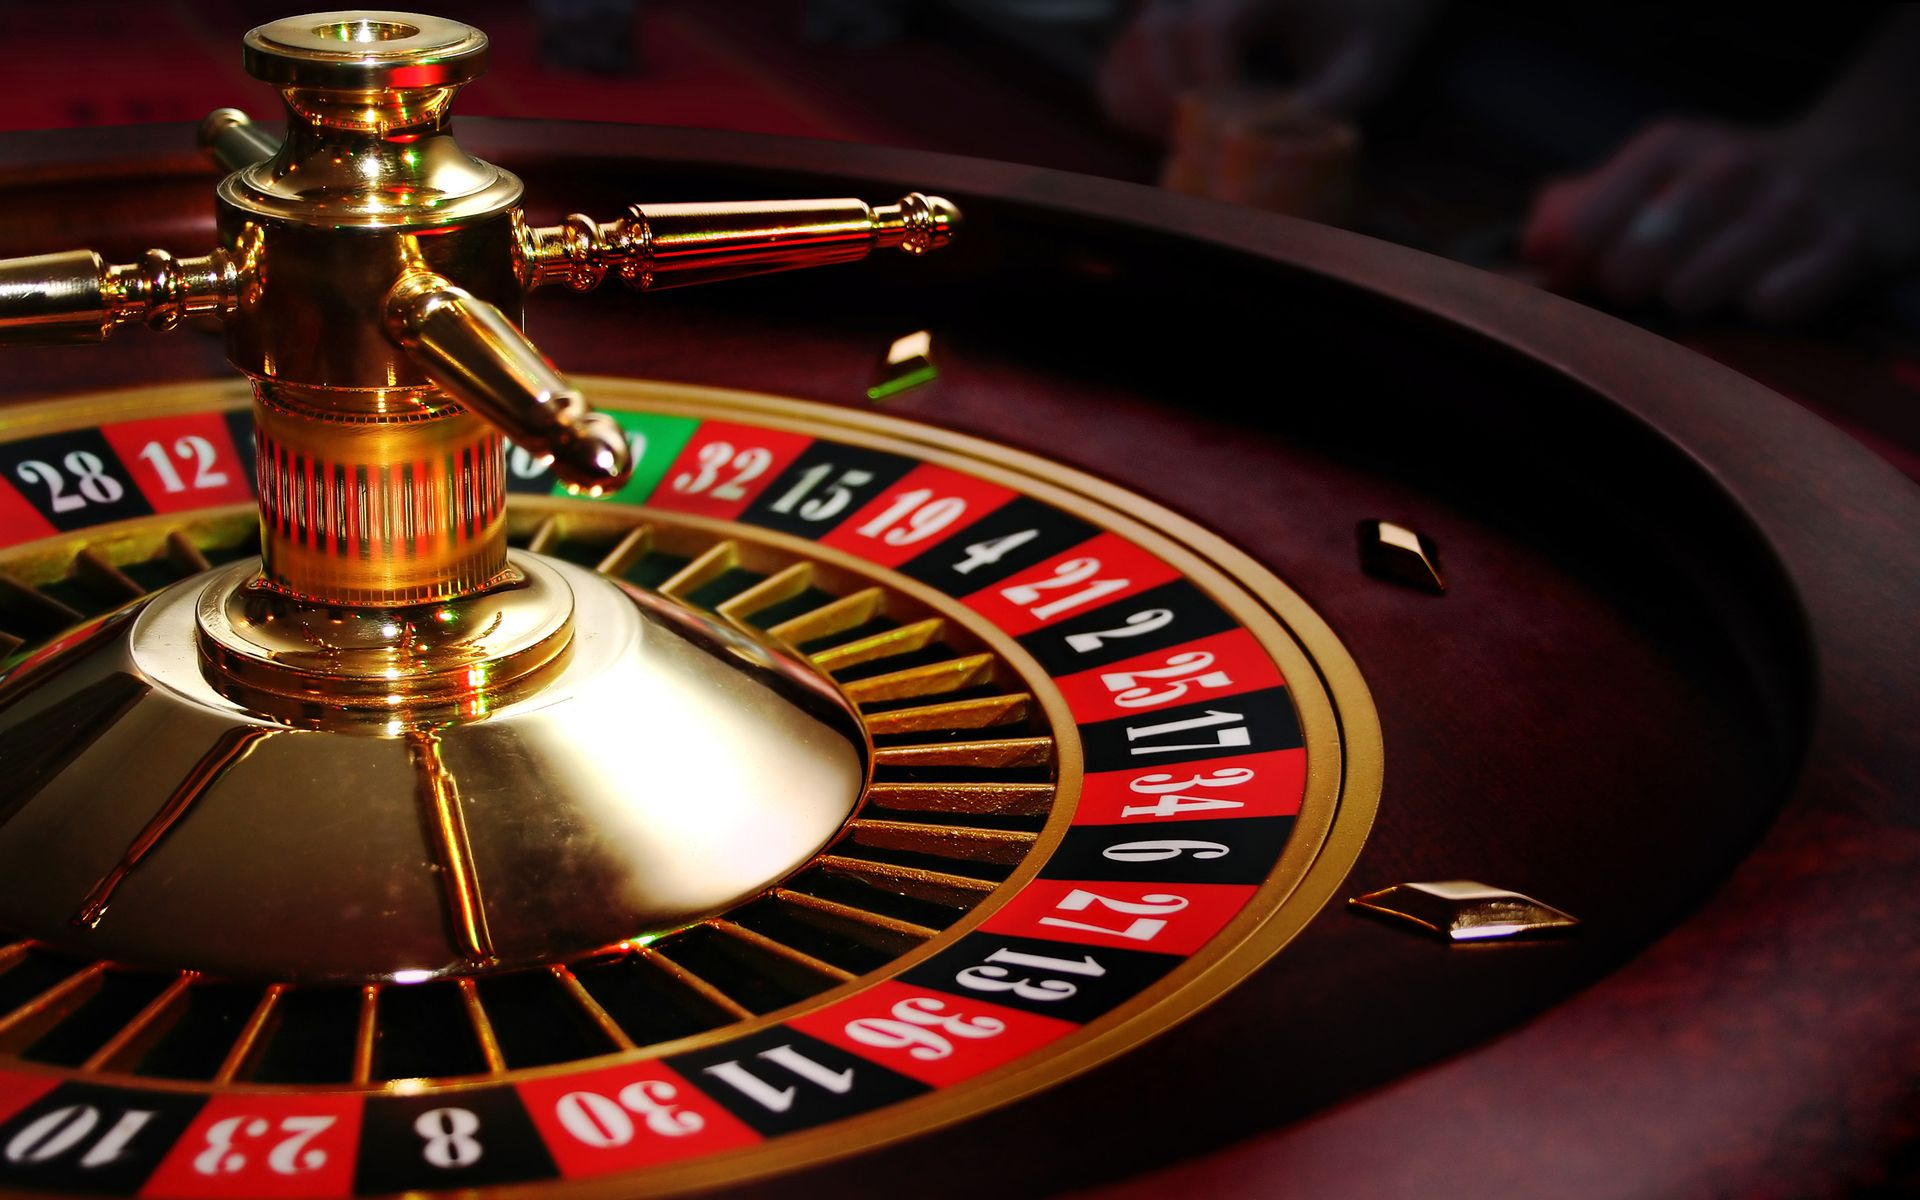 imagesjeux-de-casino-36.jpg